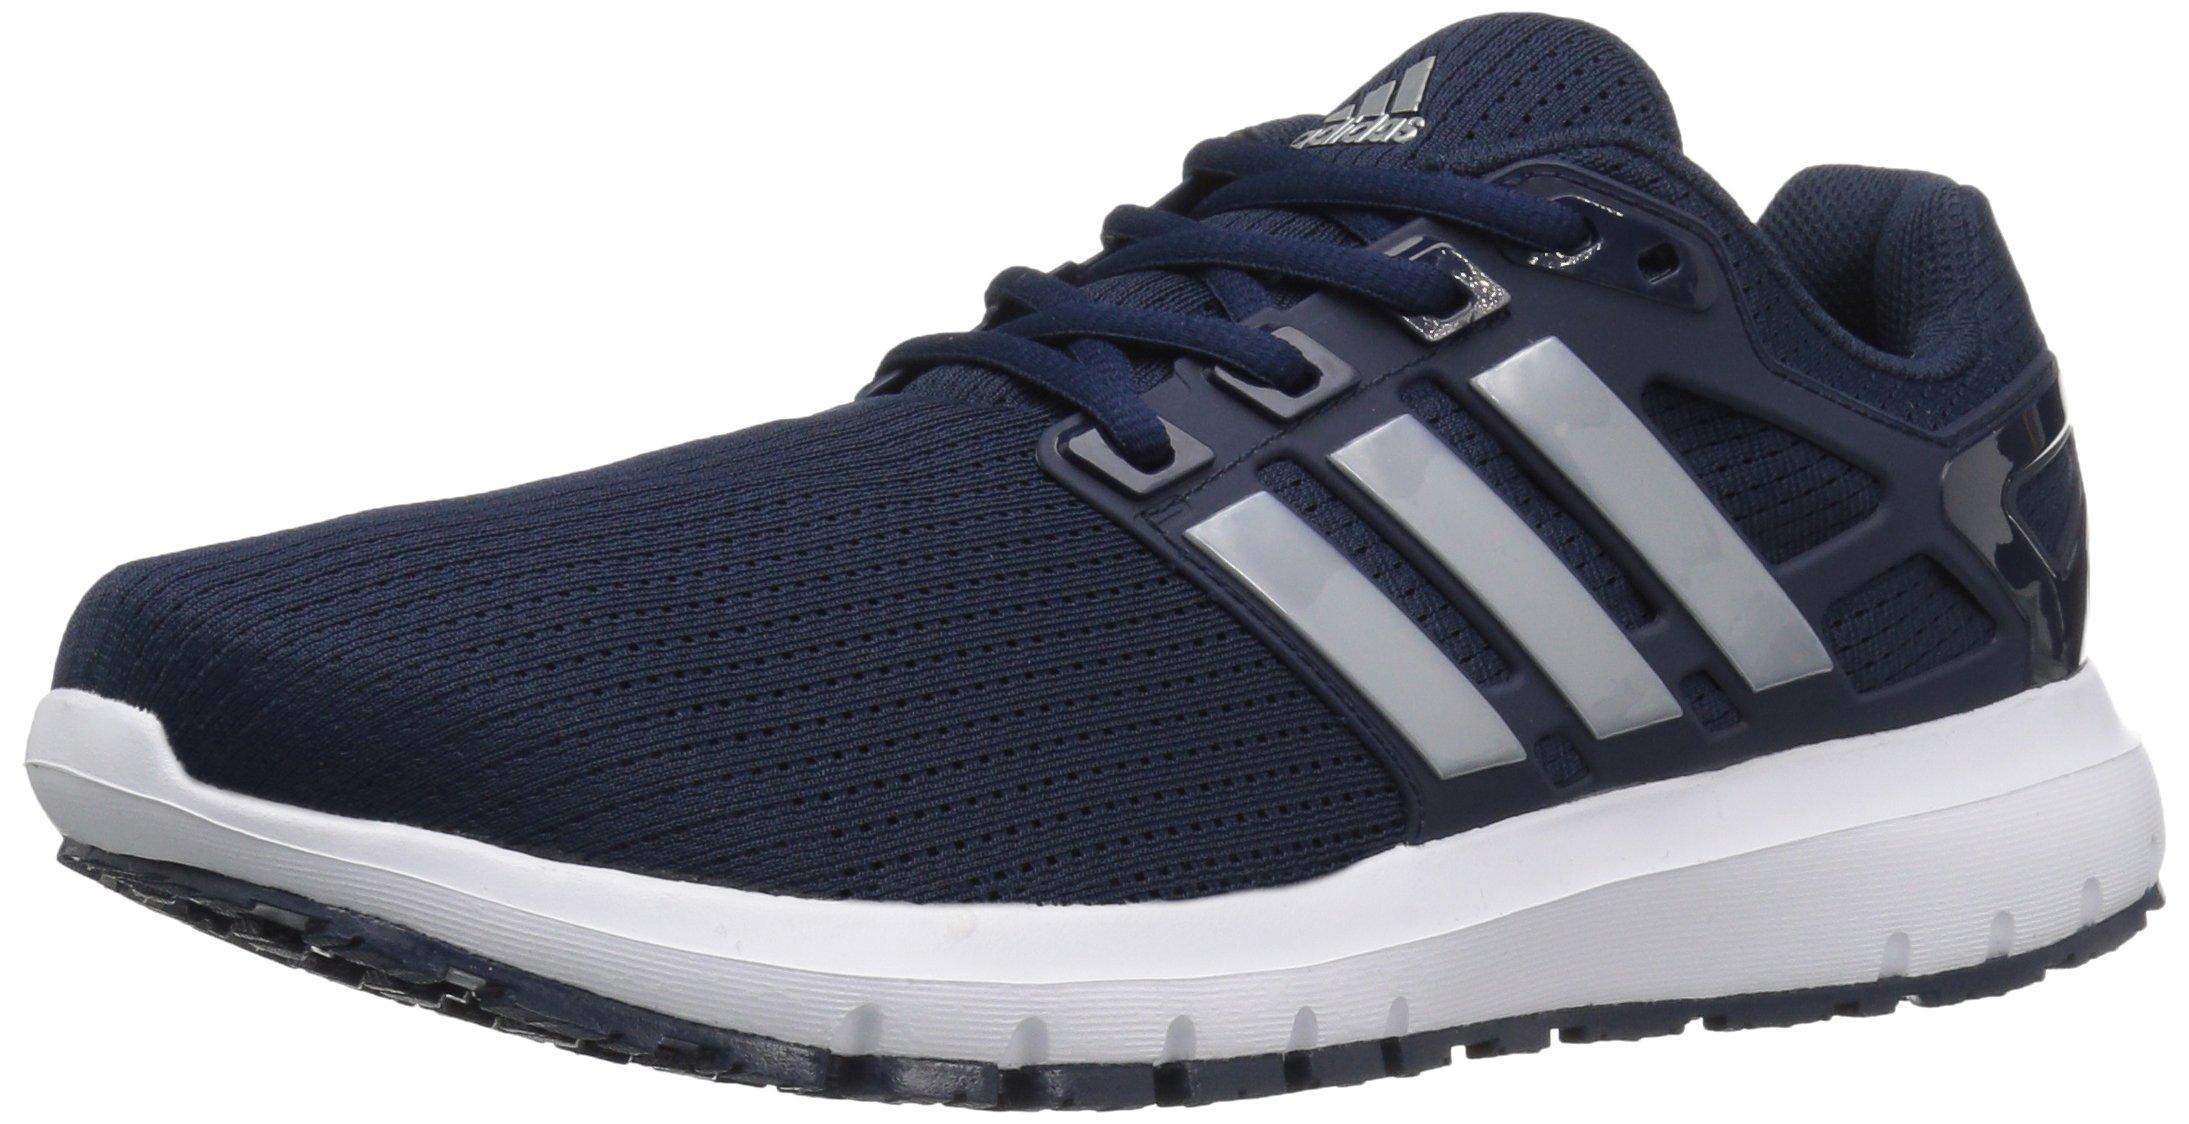 Adidas hombre 's Energy Cloud WTC m corriendo zapatos , Collegiate Navy